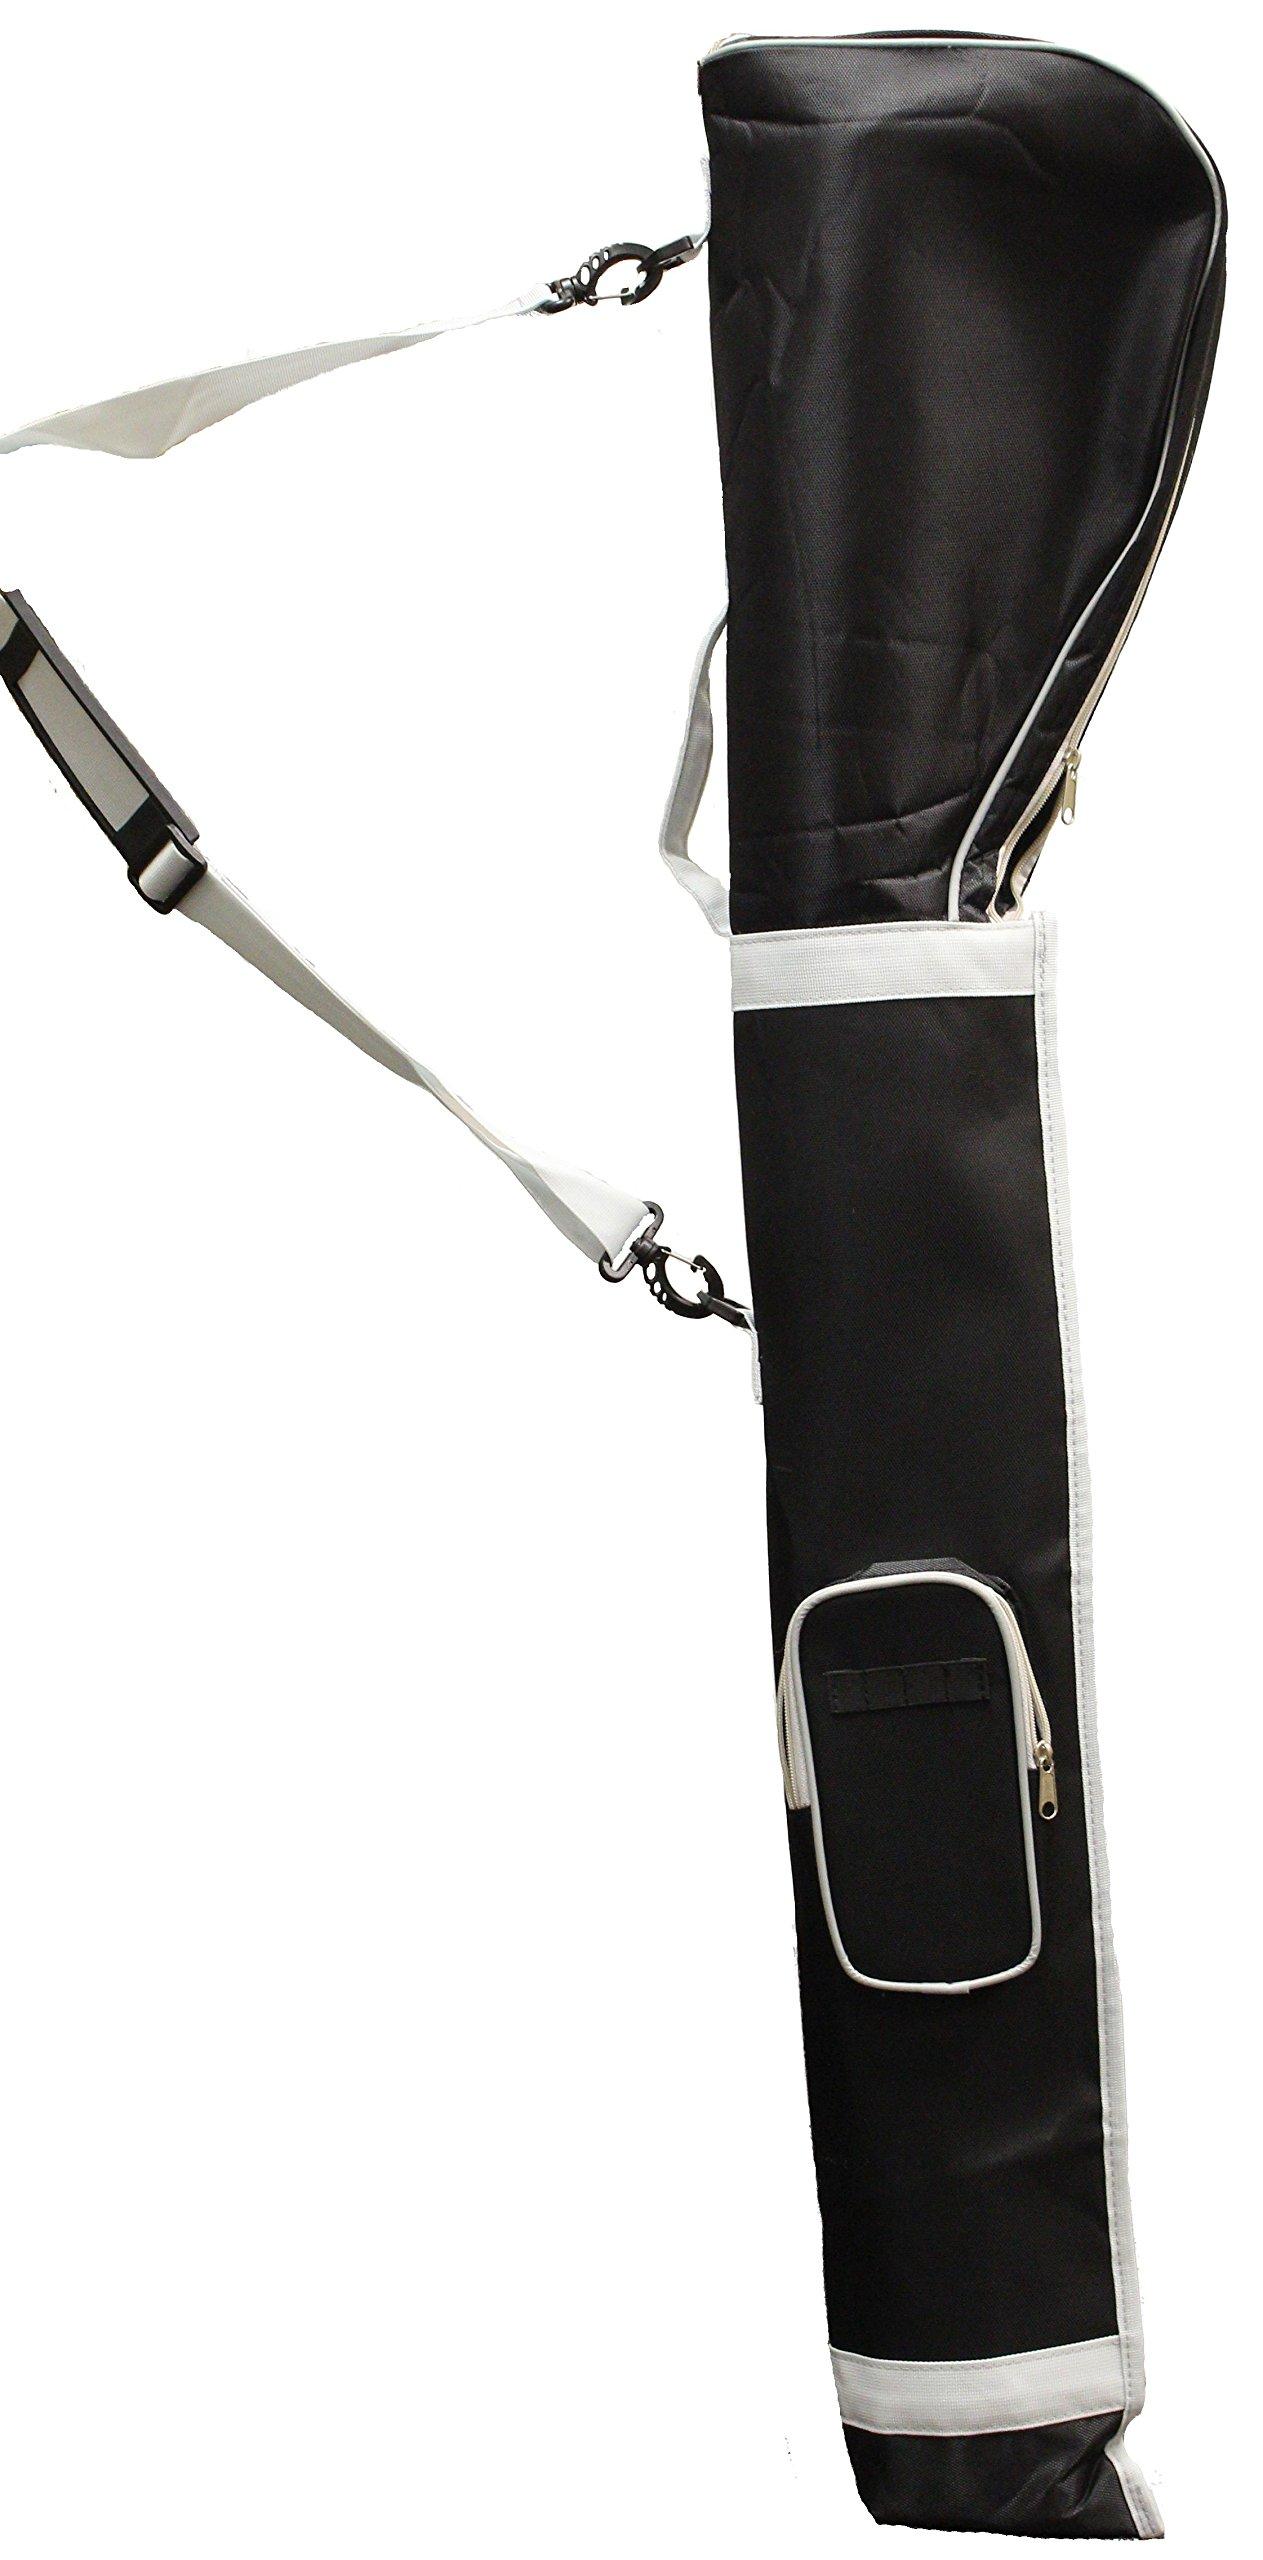 JP Lann Deluxe Adult Sunday Golf Bag